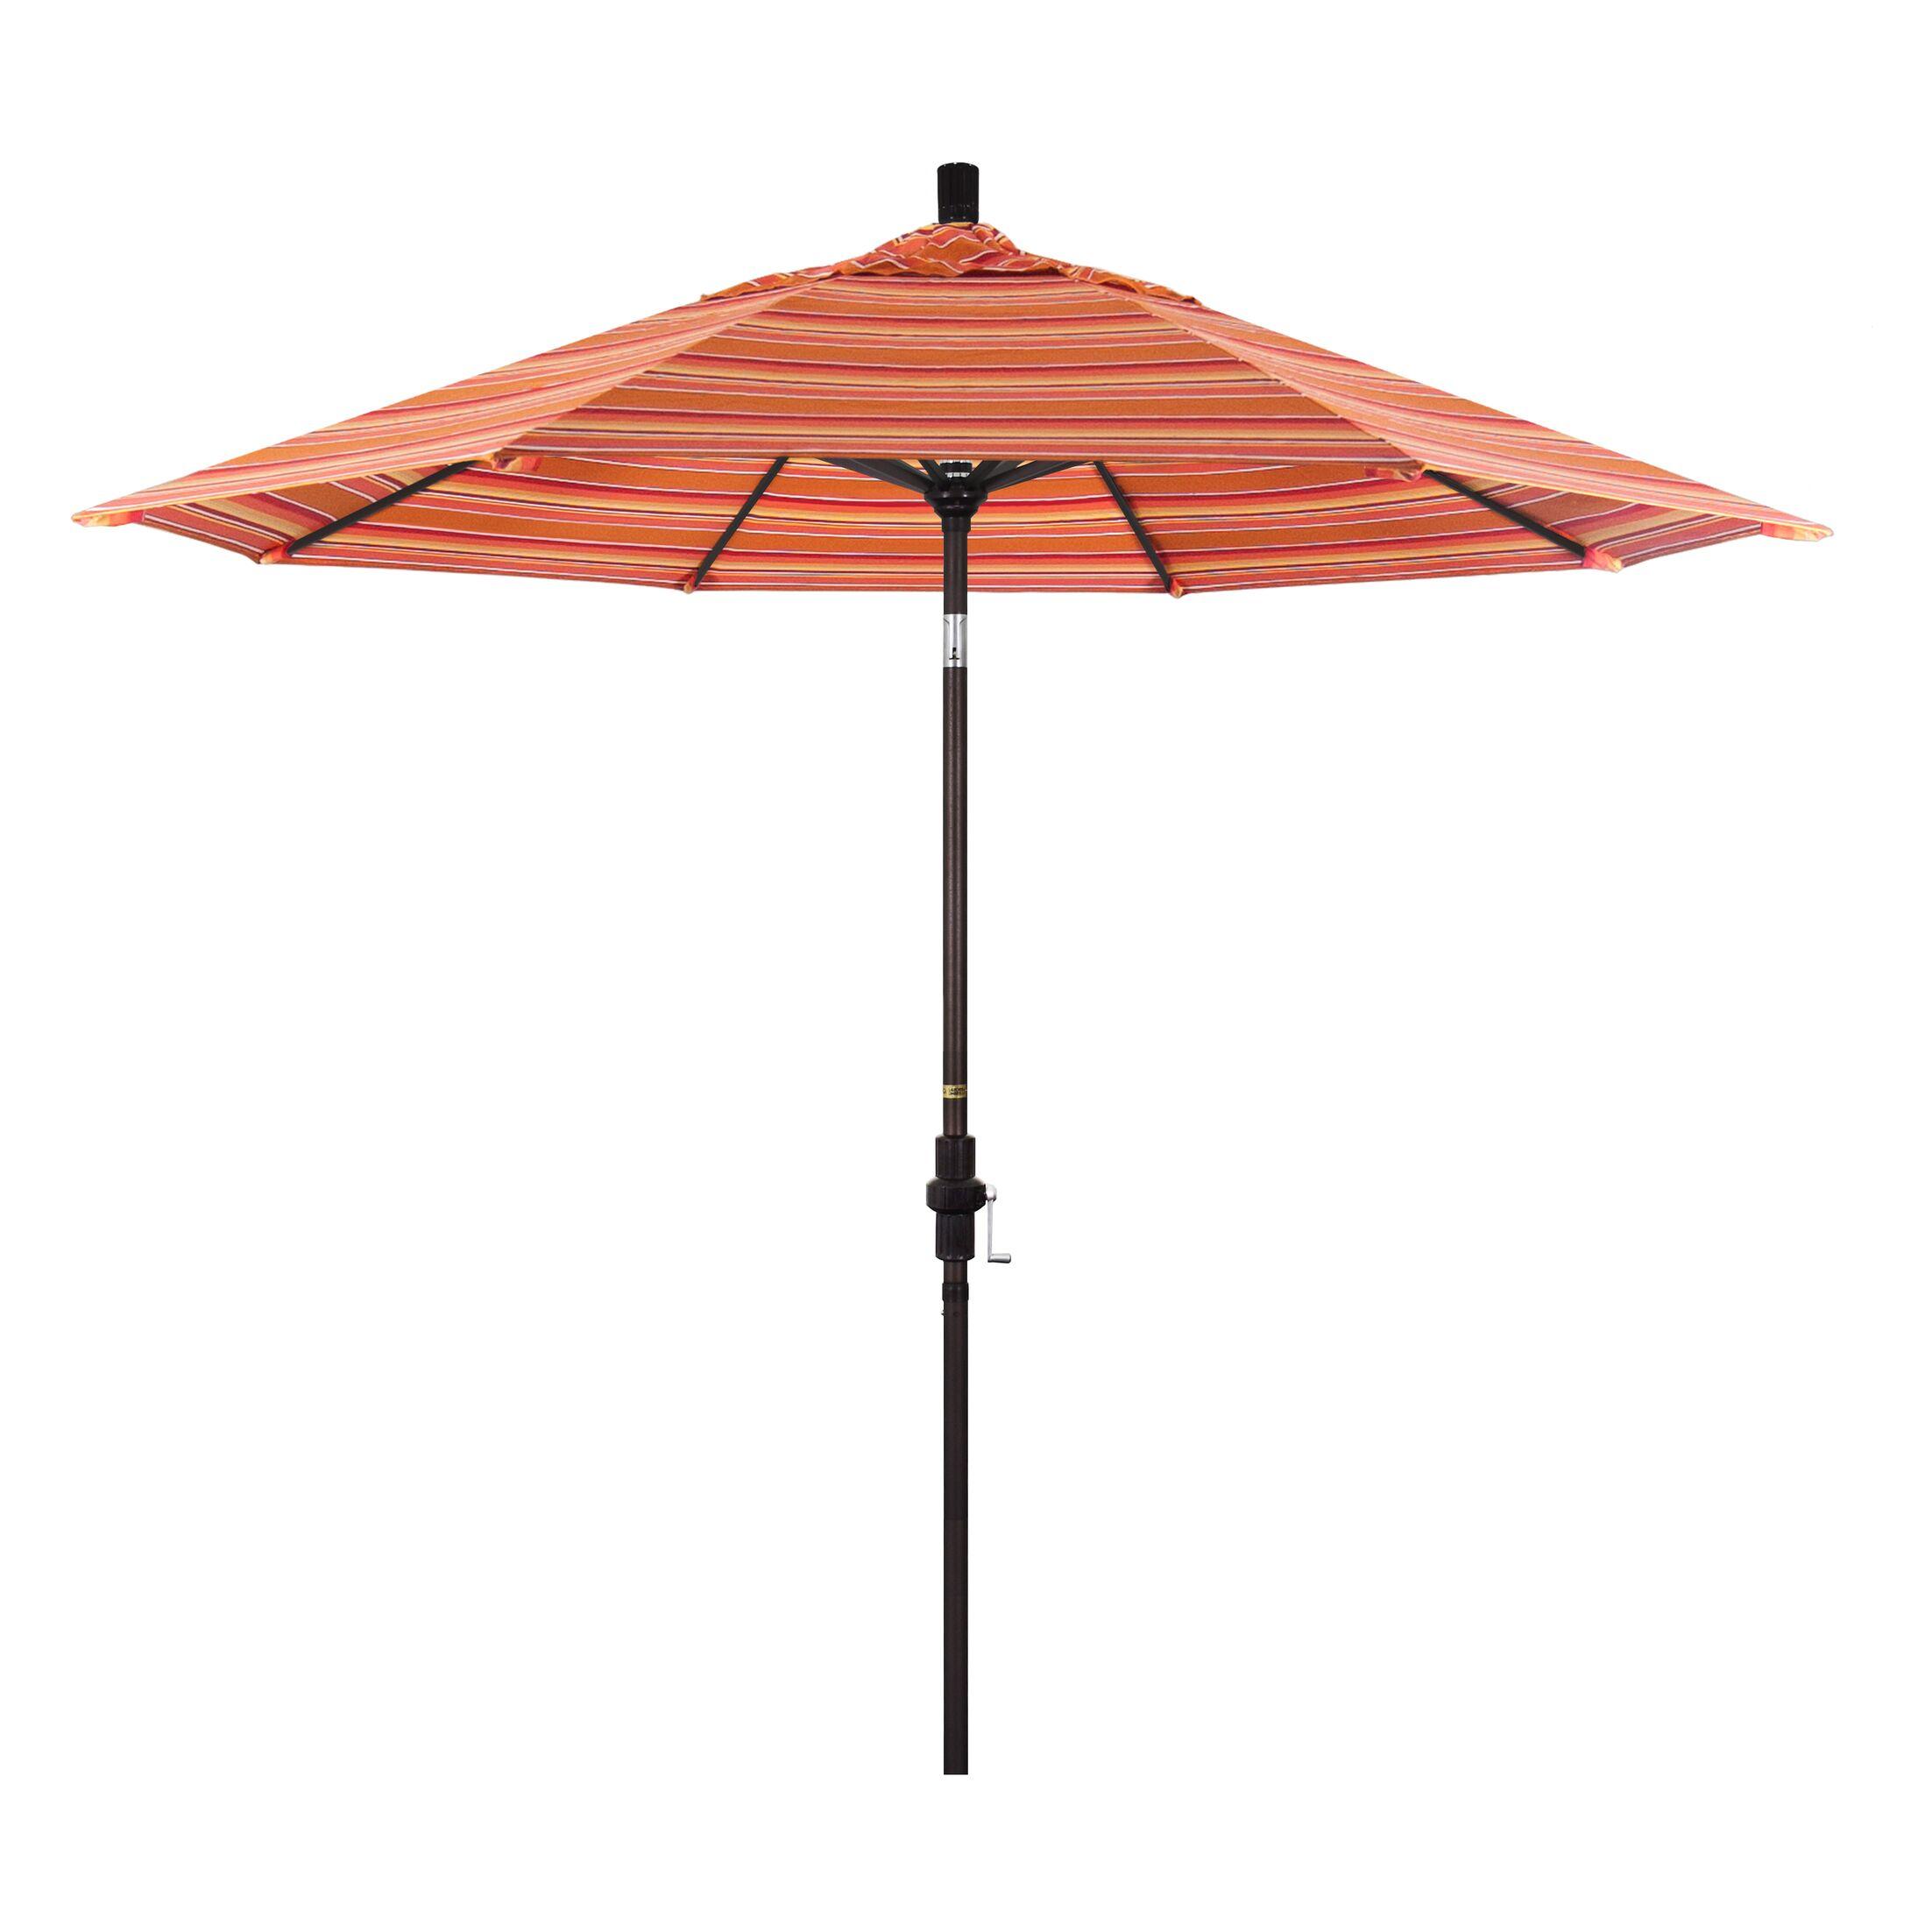 9' Market Umbrella Color: Dolce Mango, Frame Finish: Matted White